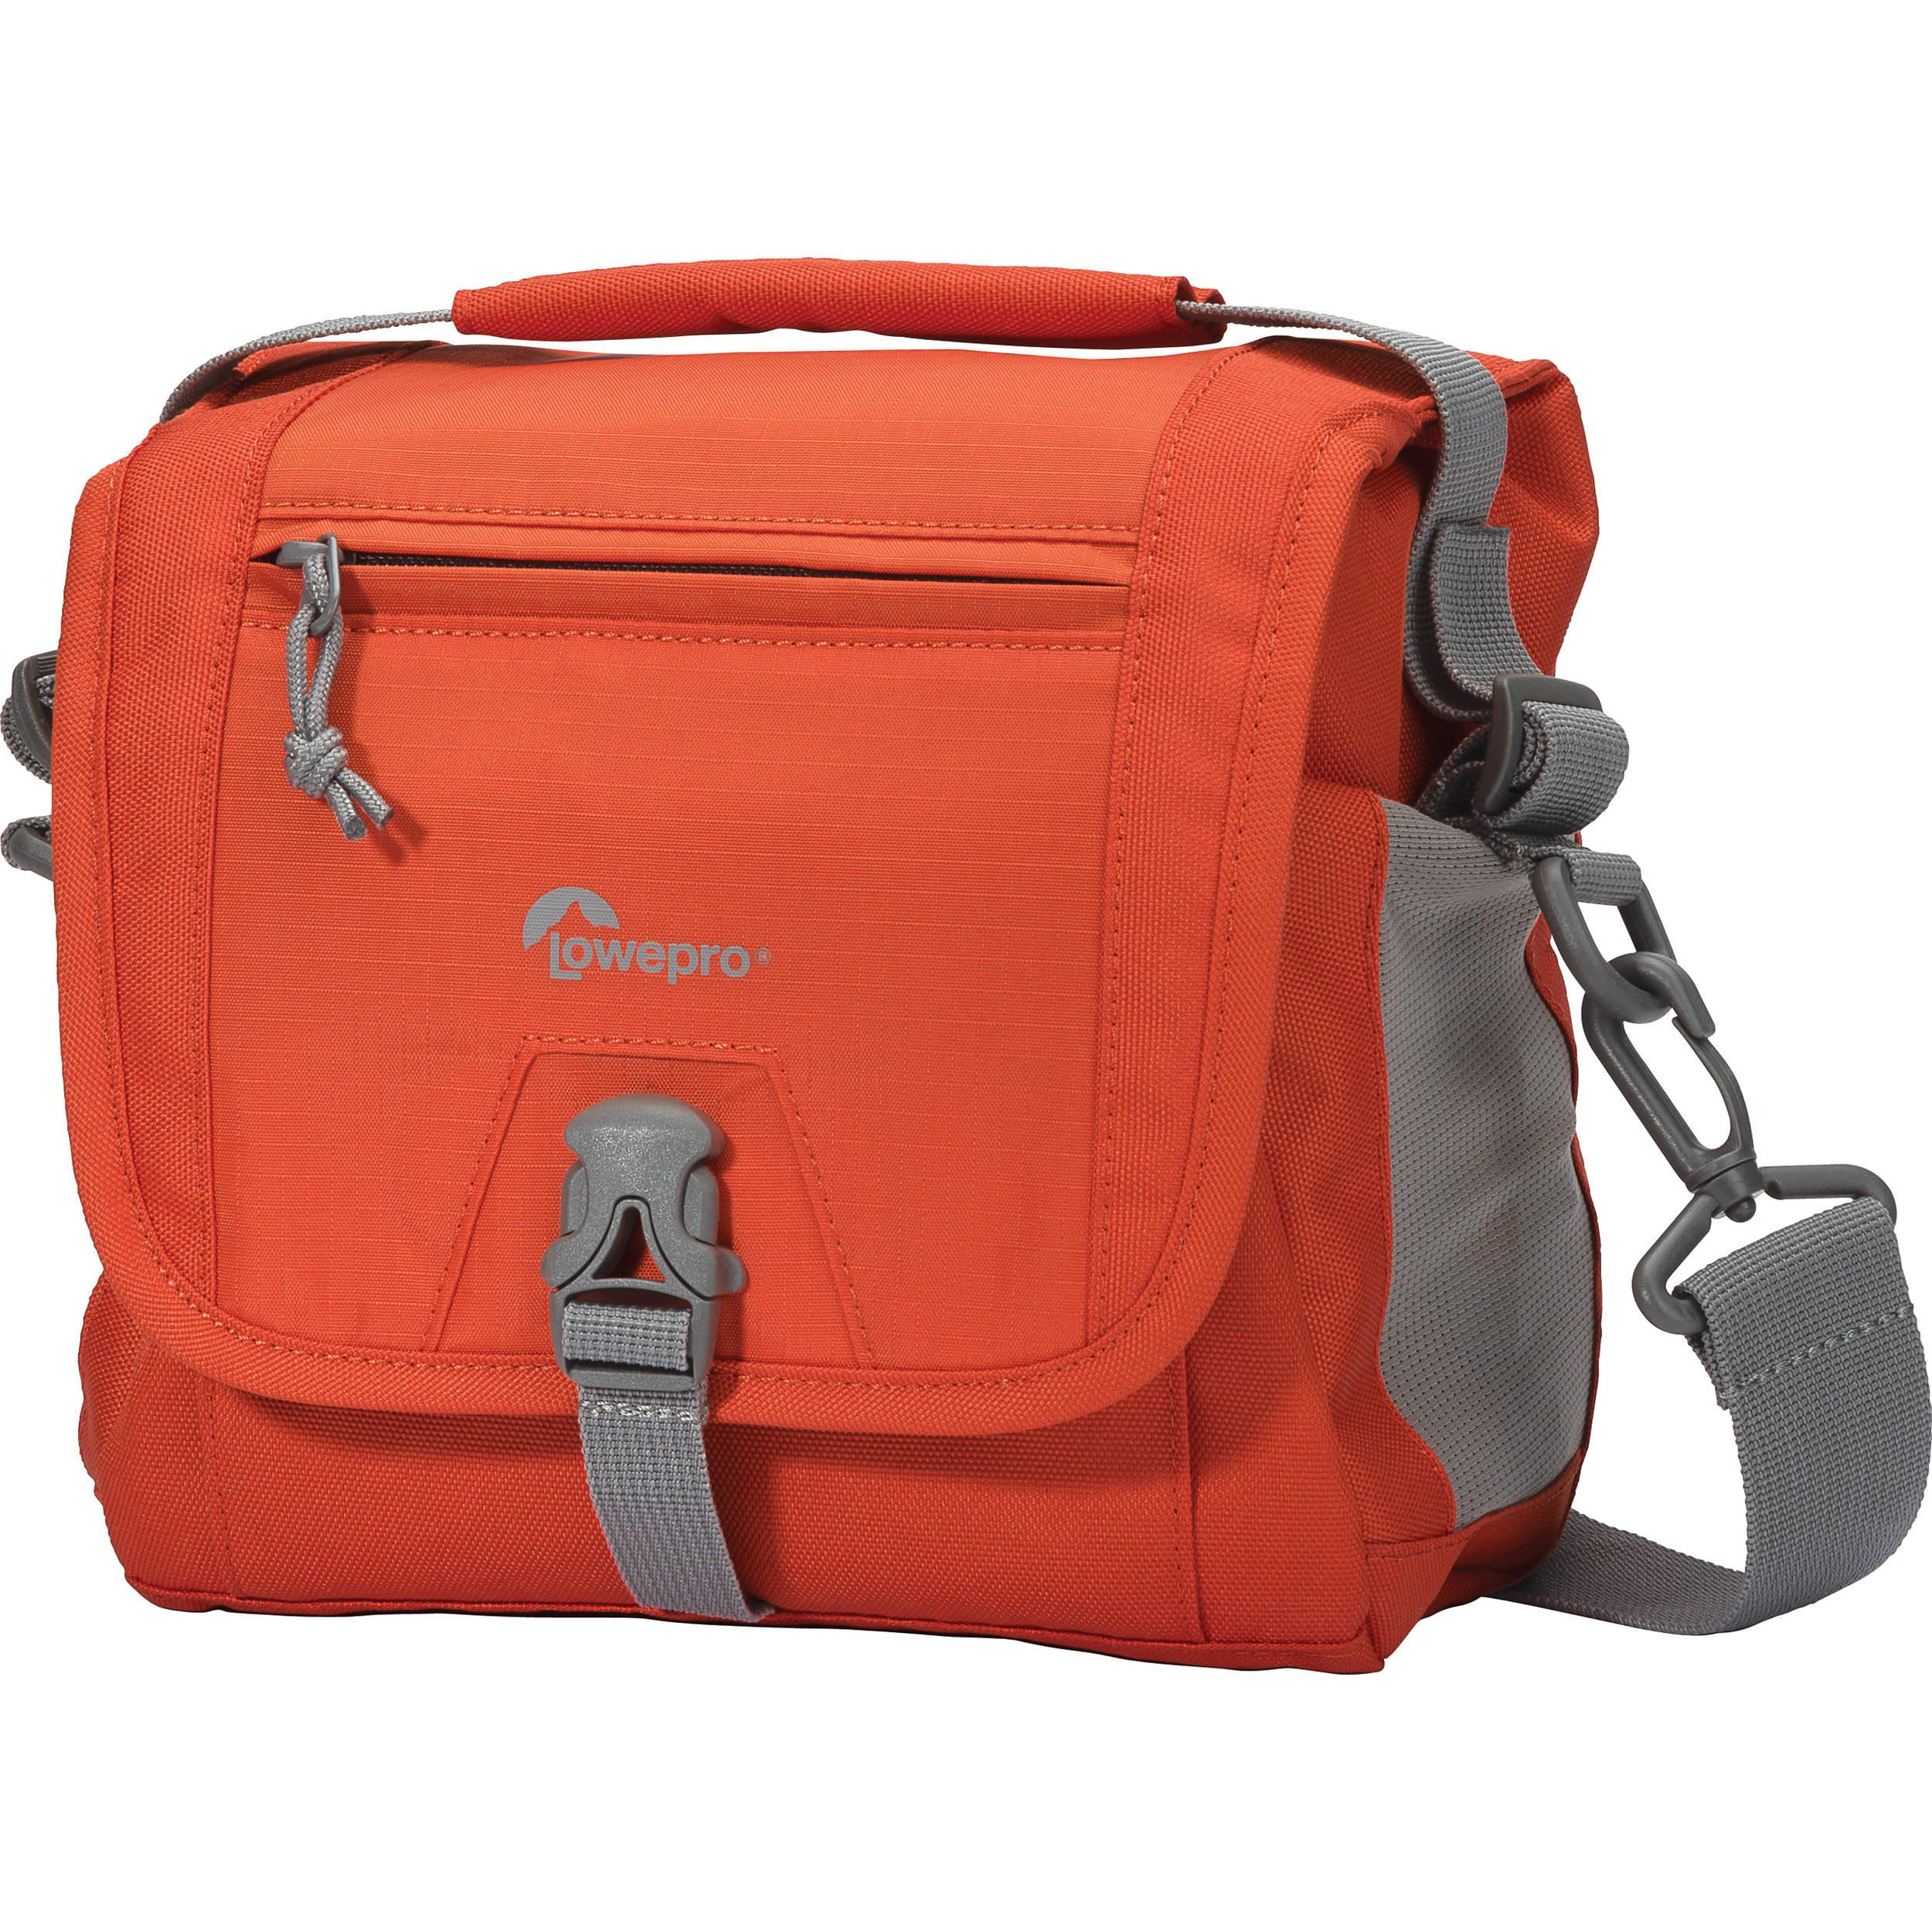 Lowepro Nova Sport 7L AW Action Cam Bag (Pepper Red)